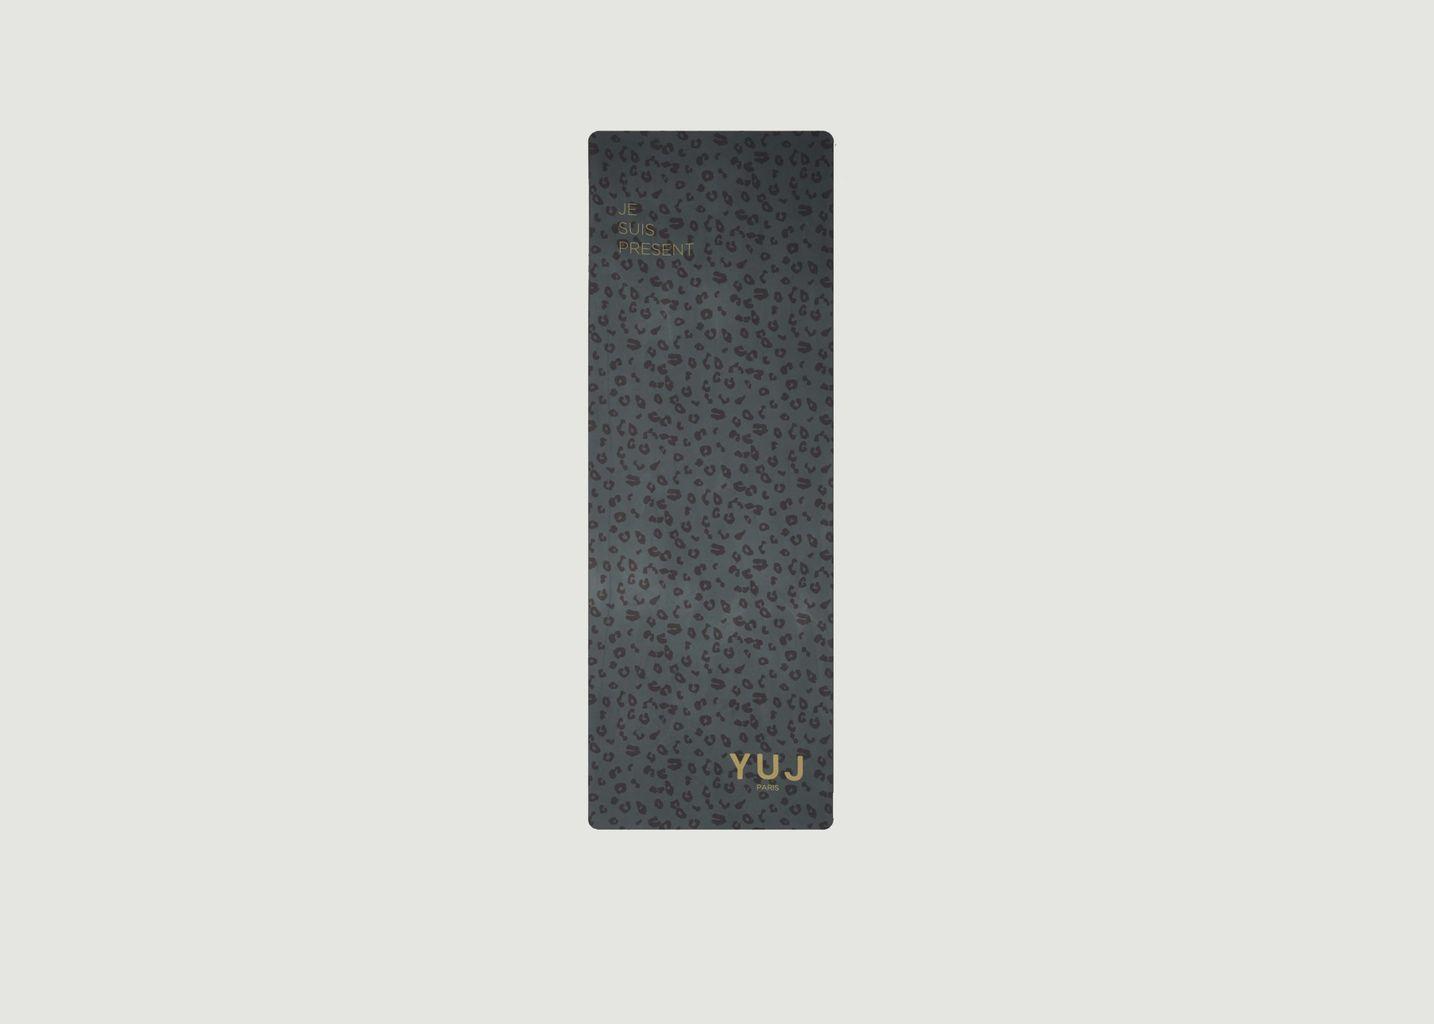 Tapis de yoga imprimé léopard Leokaki - YUJ Paris